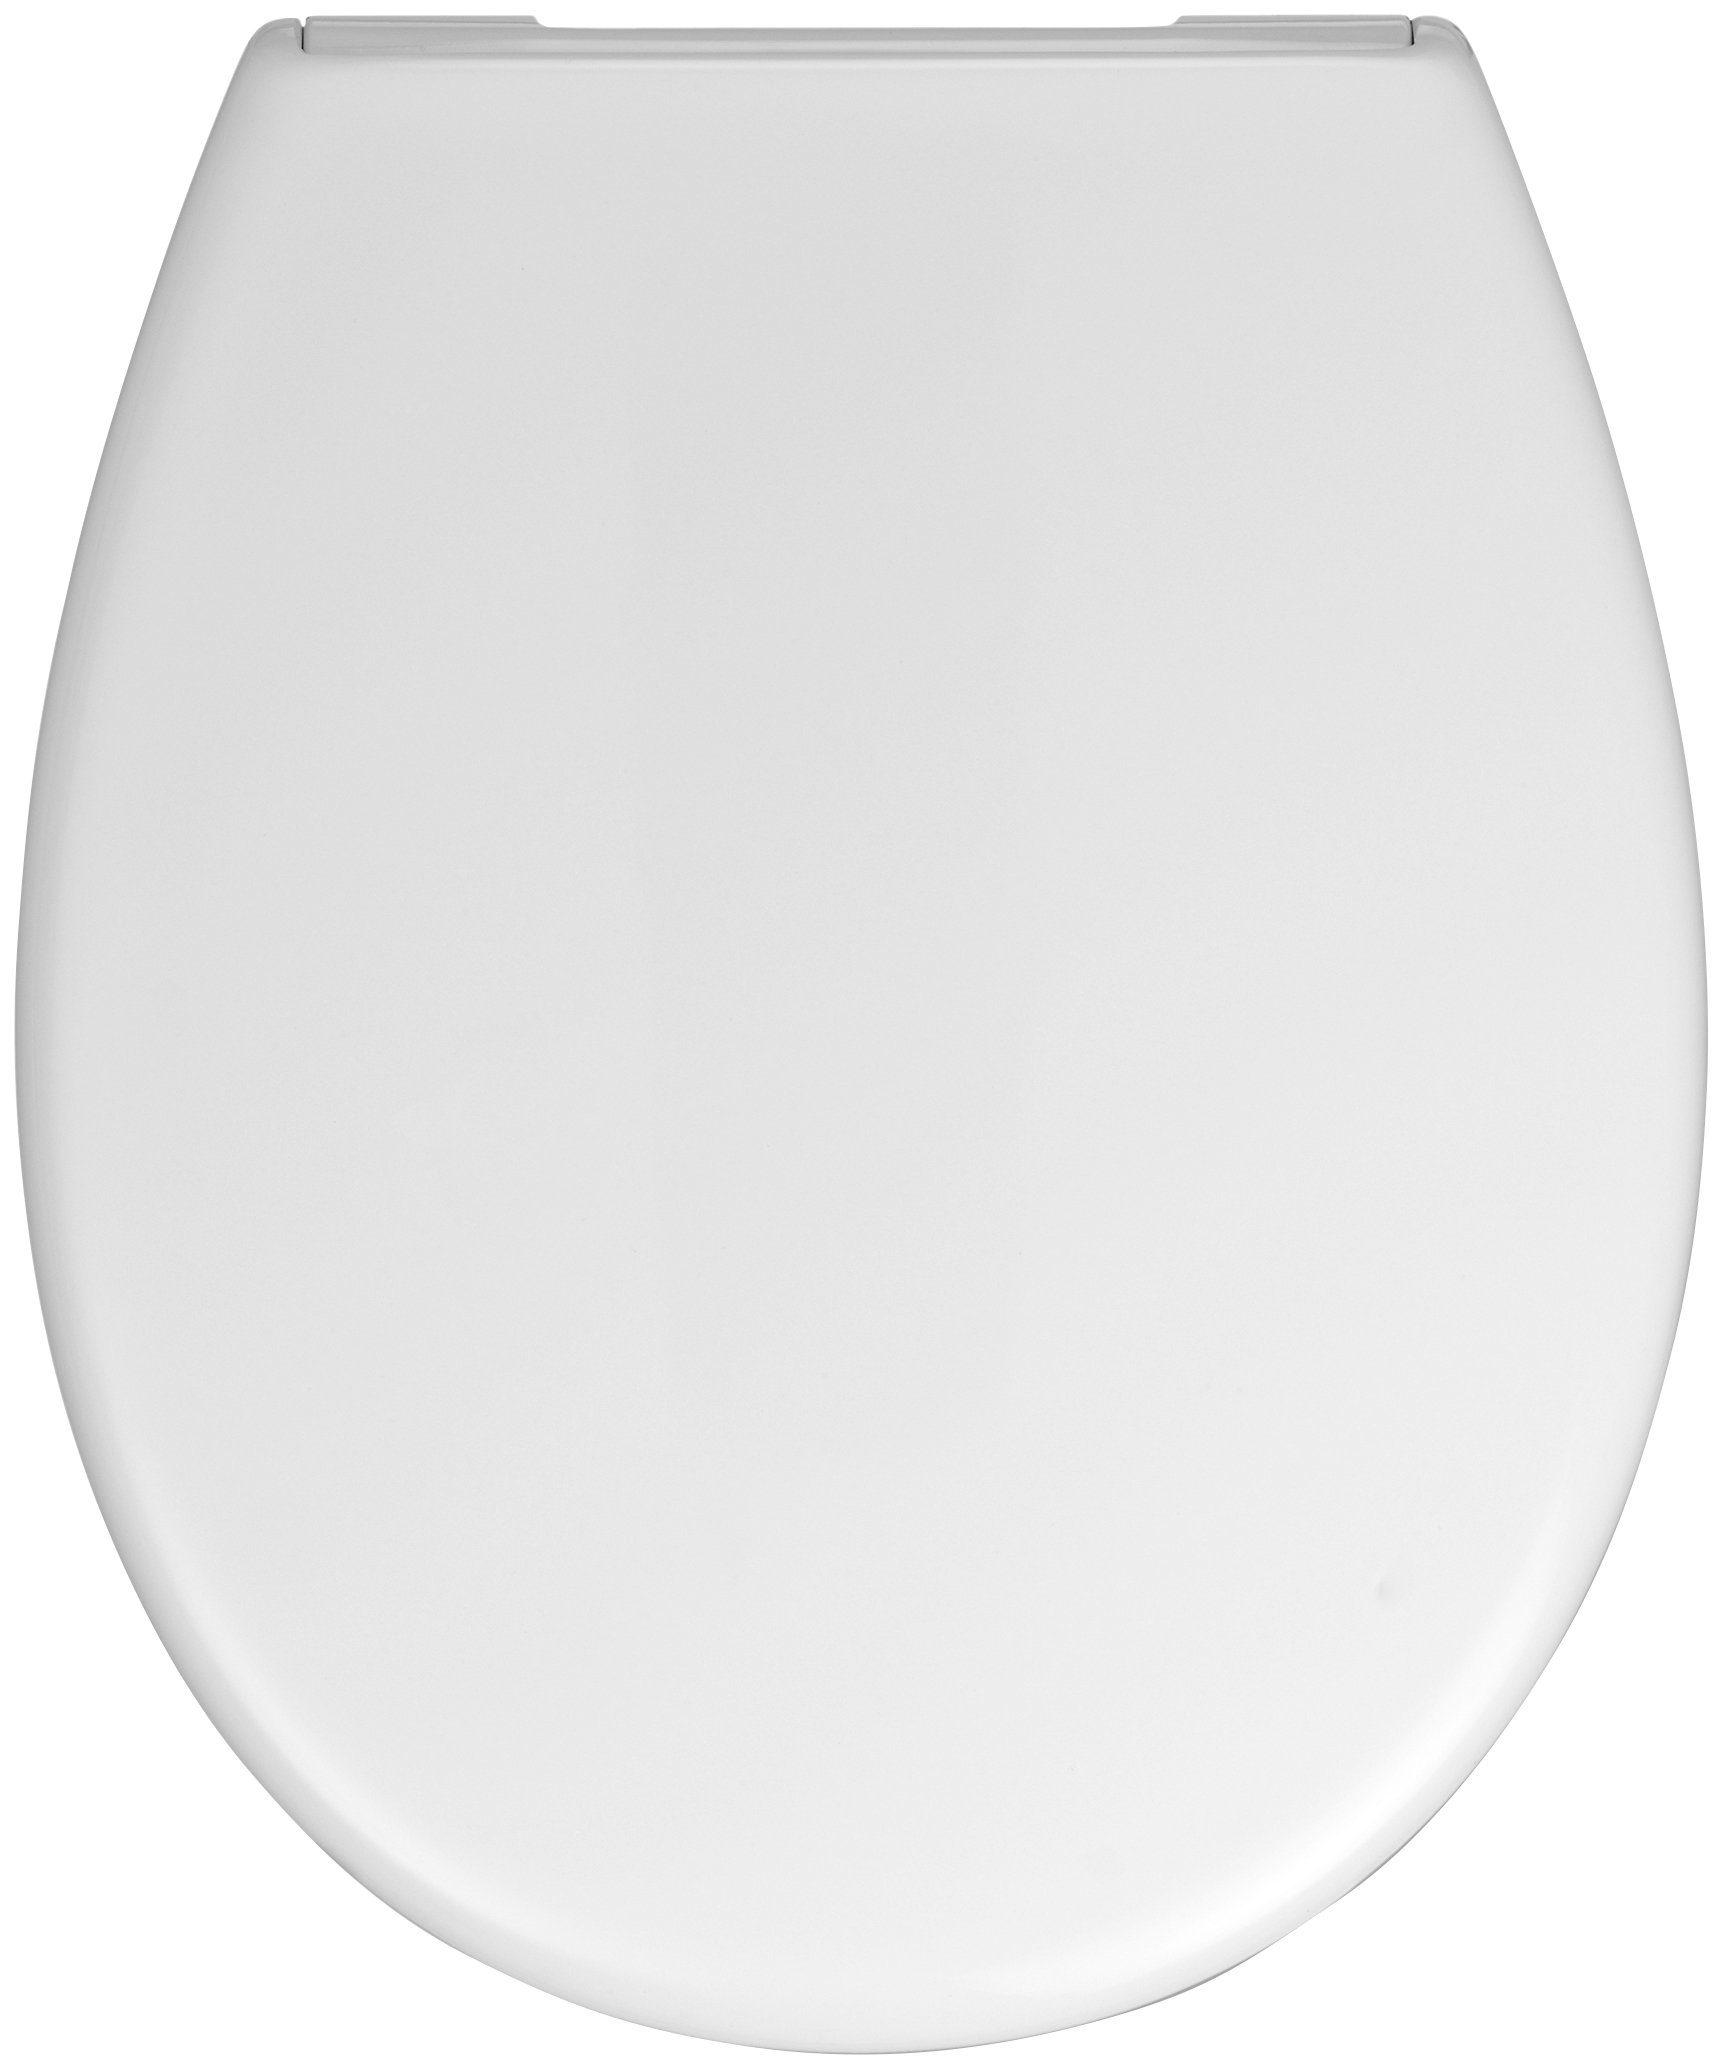 WC-Sitz »Travo«, Mit Absenkautomatik